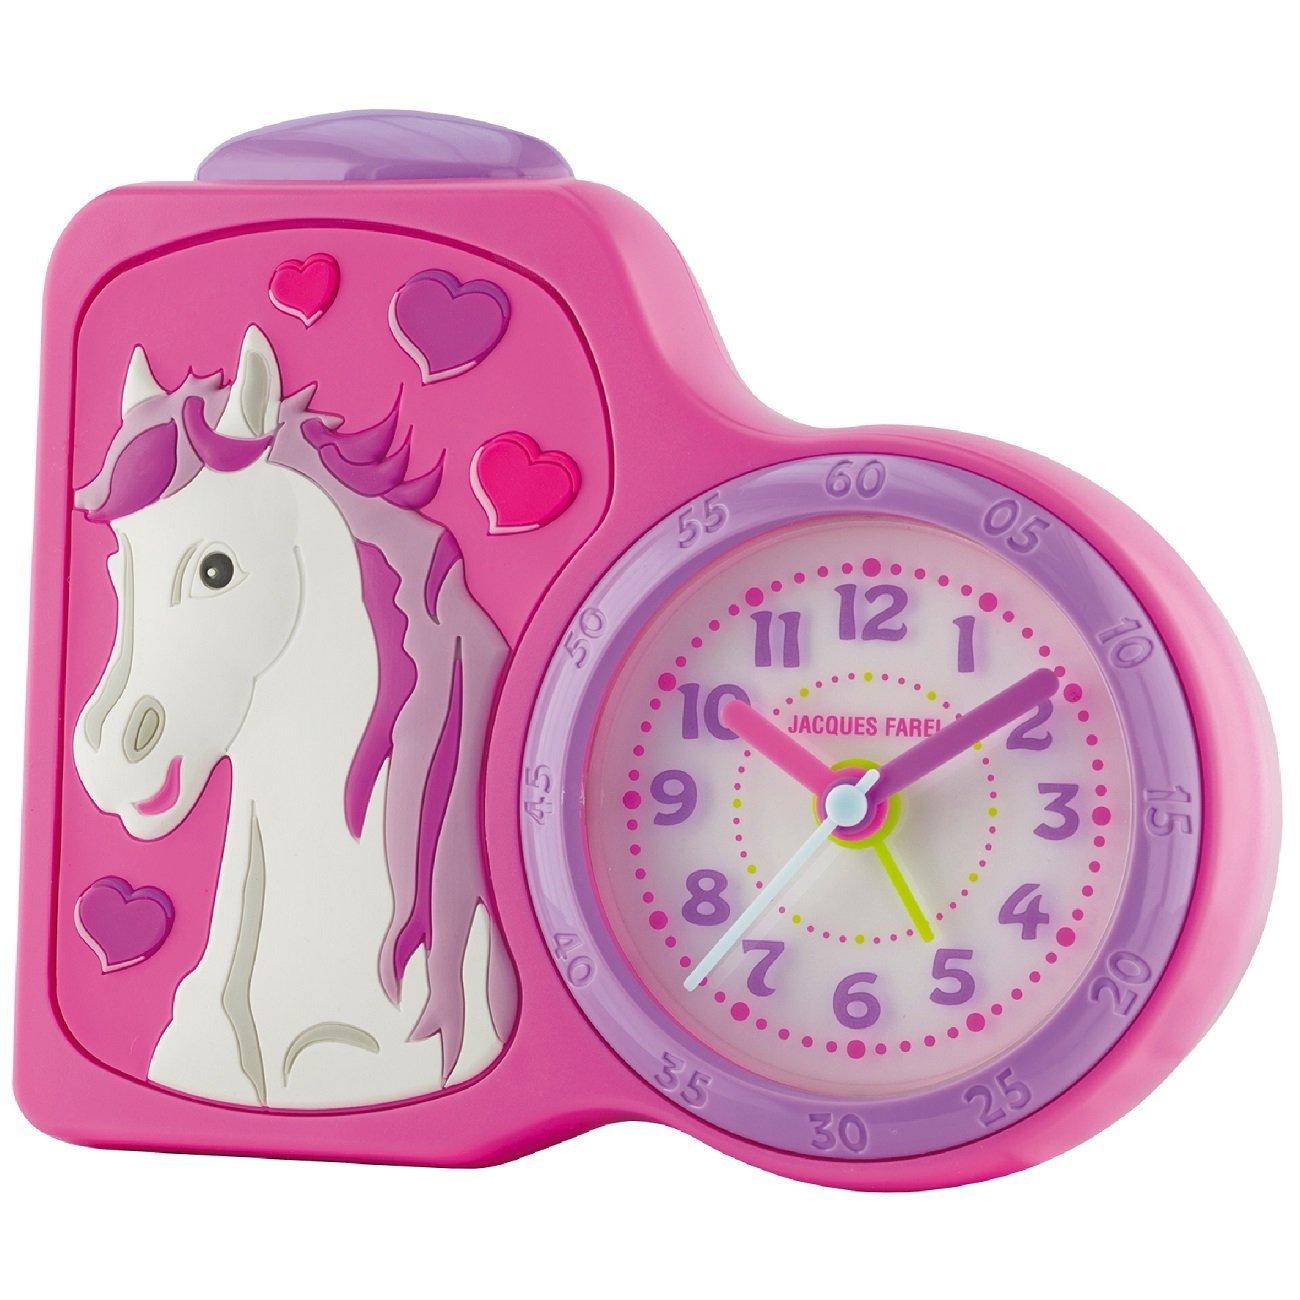 Jacques Farel ACB717 Childrens Horse Alarm Clock Jacques Farel Alarm Clocks ACB717HS